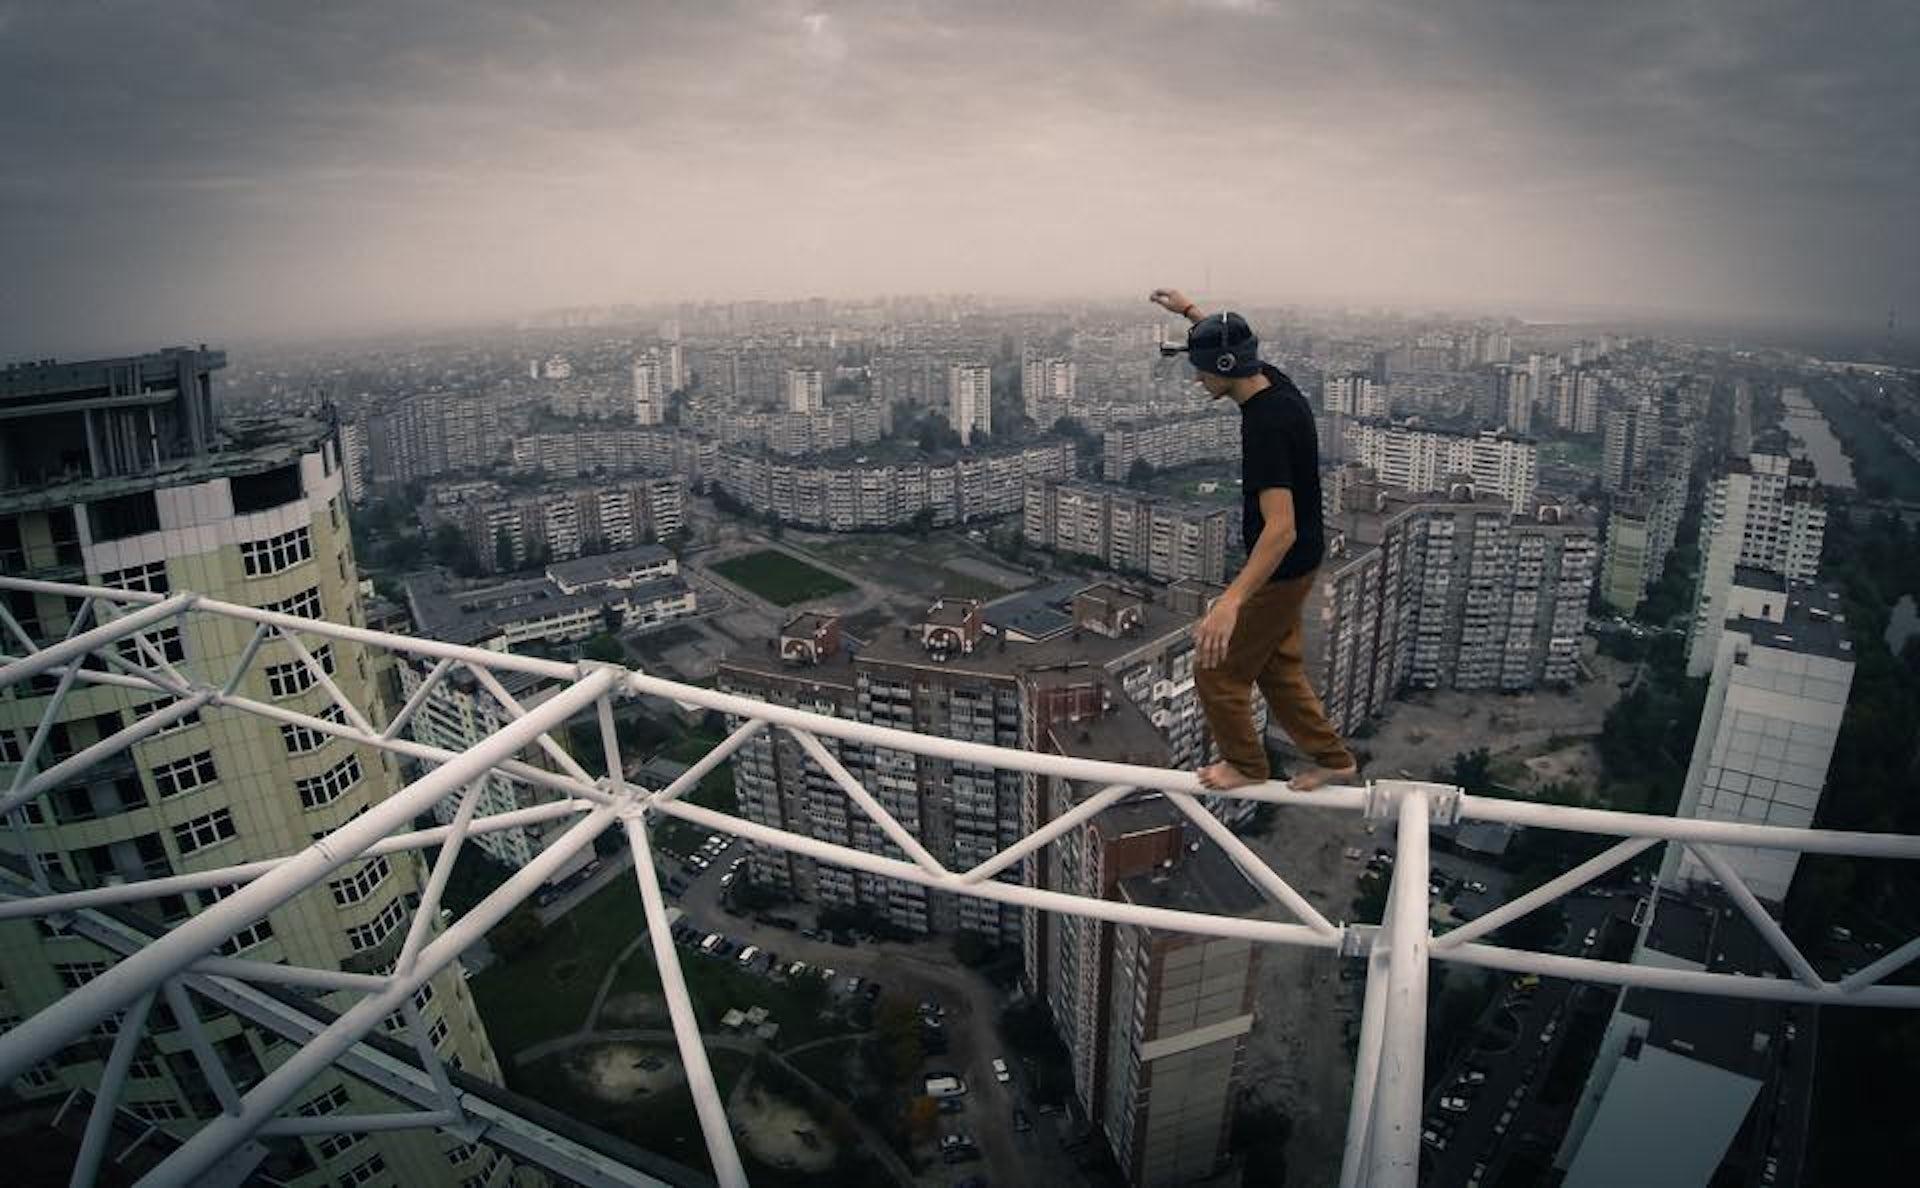 why daredevil skyscraper climbing videos give you sweaty palms